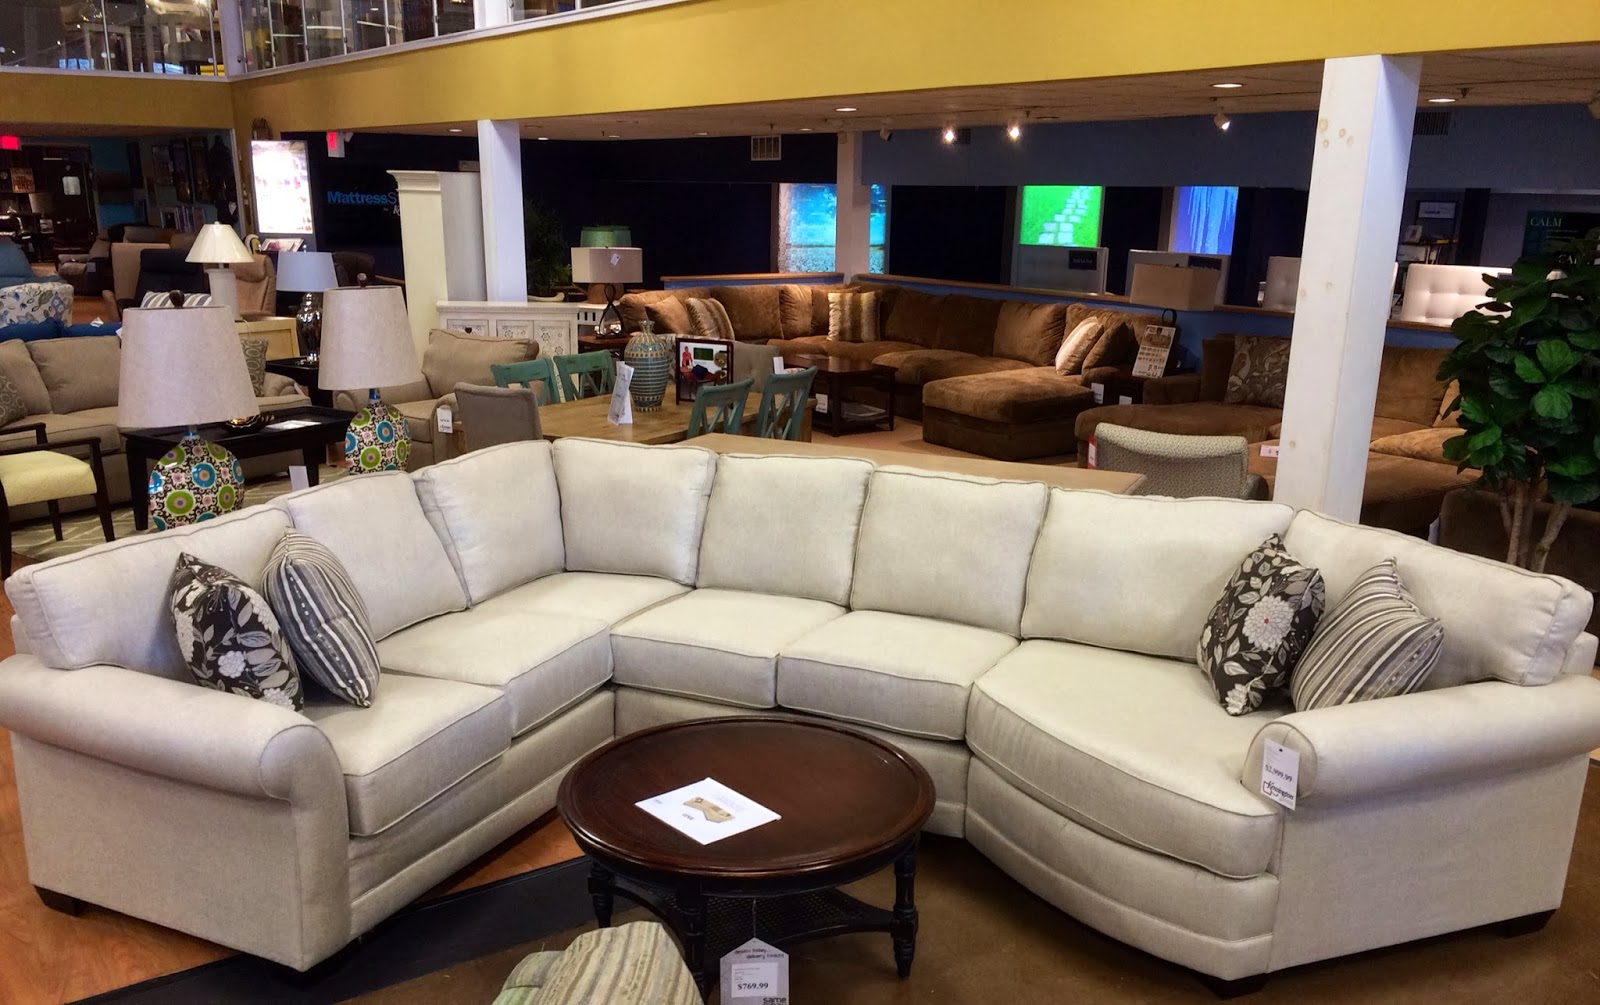 Design Your Own Custom Sofa